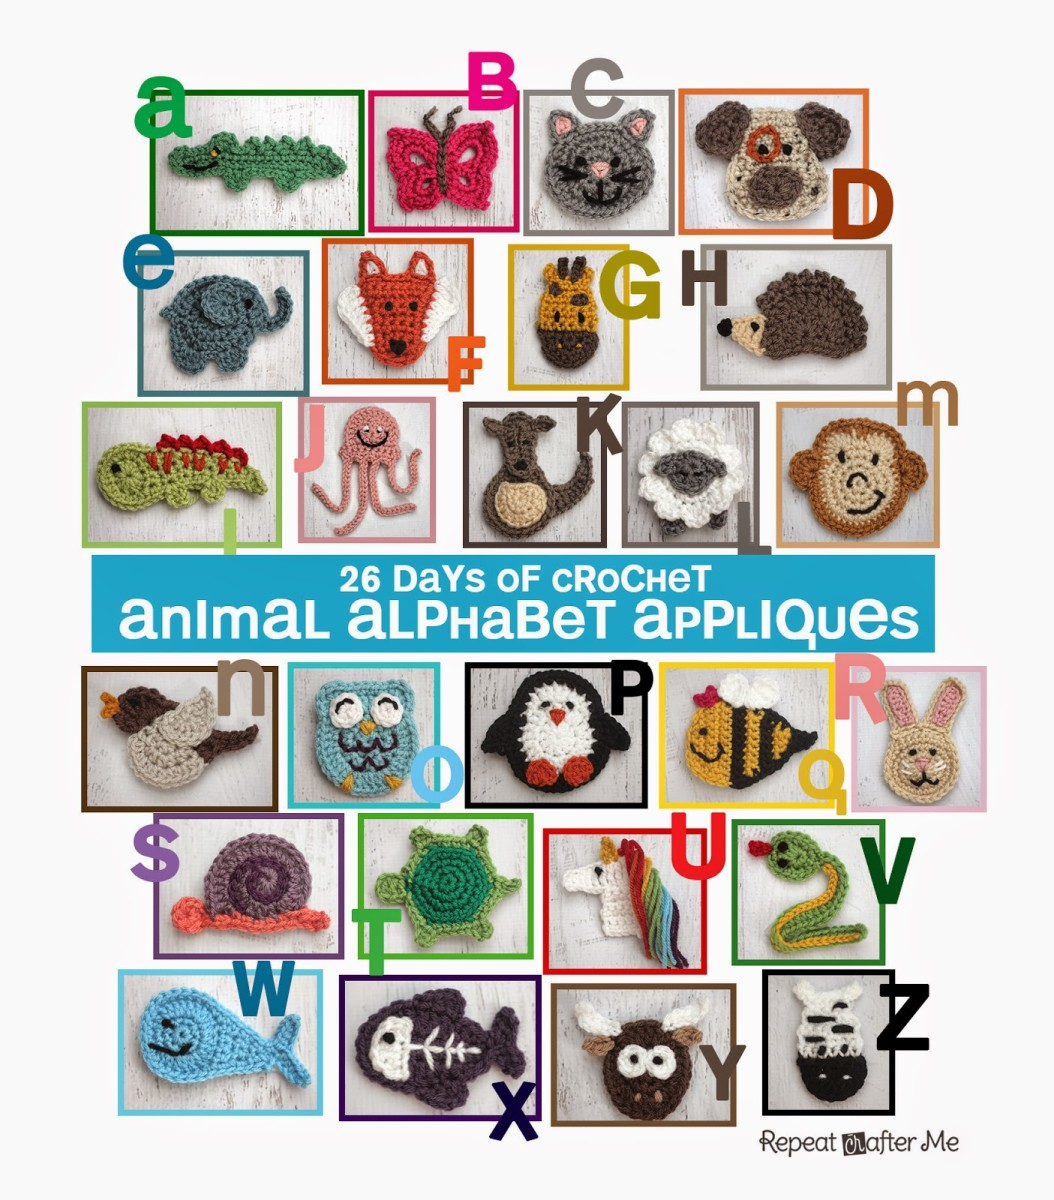 Crochet Patterns Zoo Animals : Free Zoo Animal Crochet Blanket Patterns and Animal Applique Patterns ...